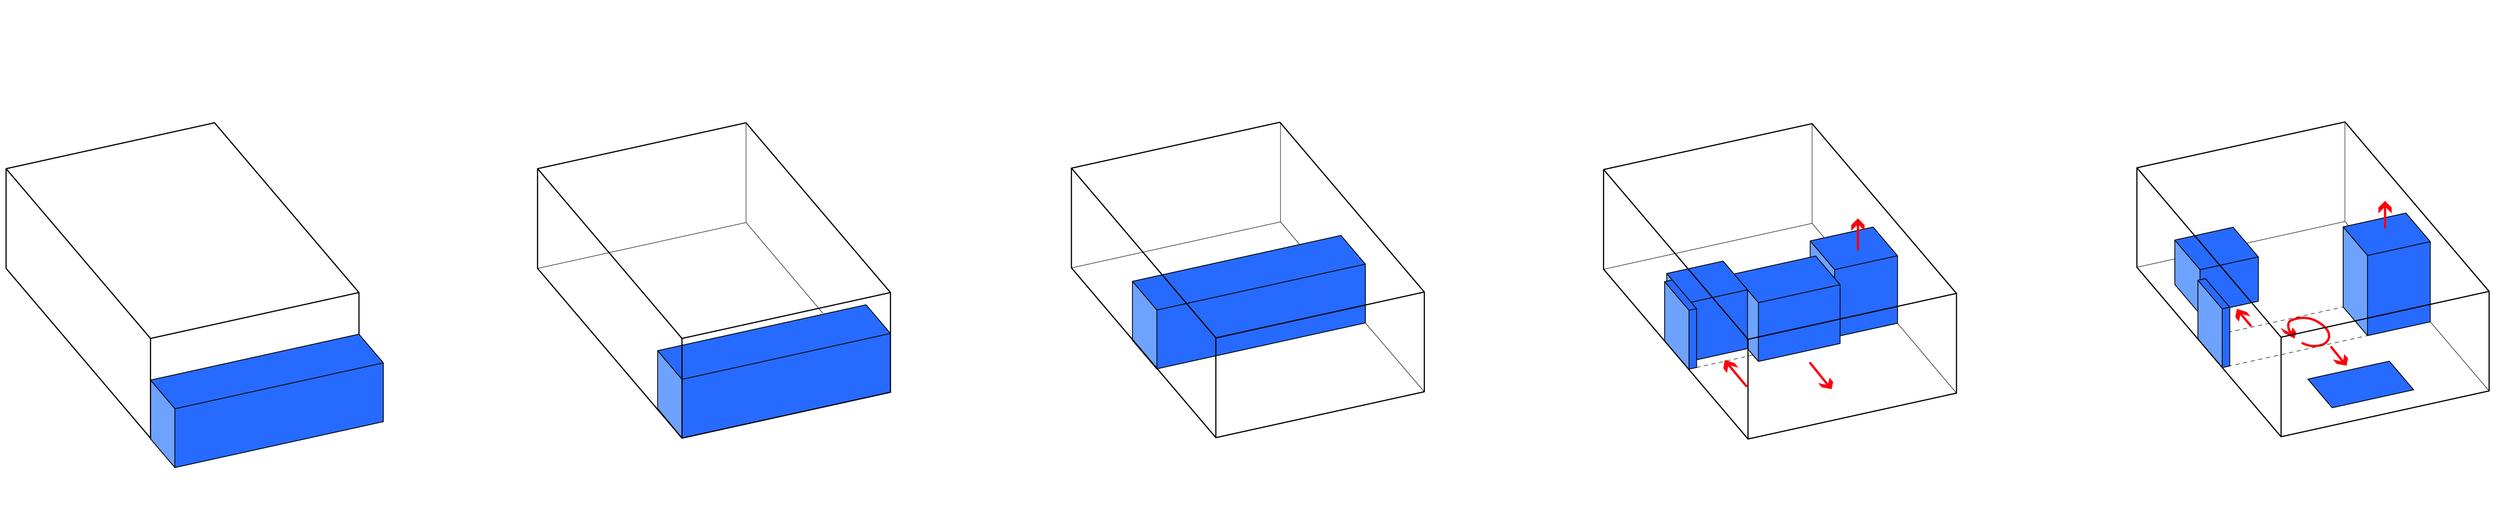 typology diagrams-01.jpg